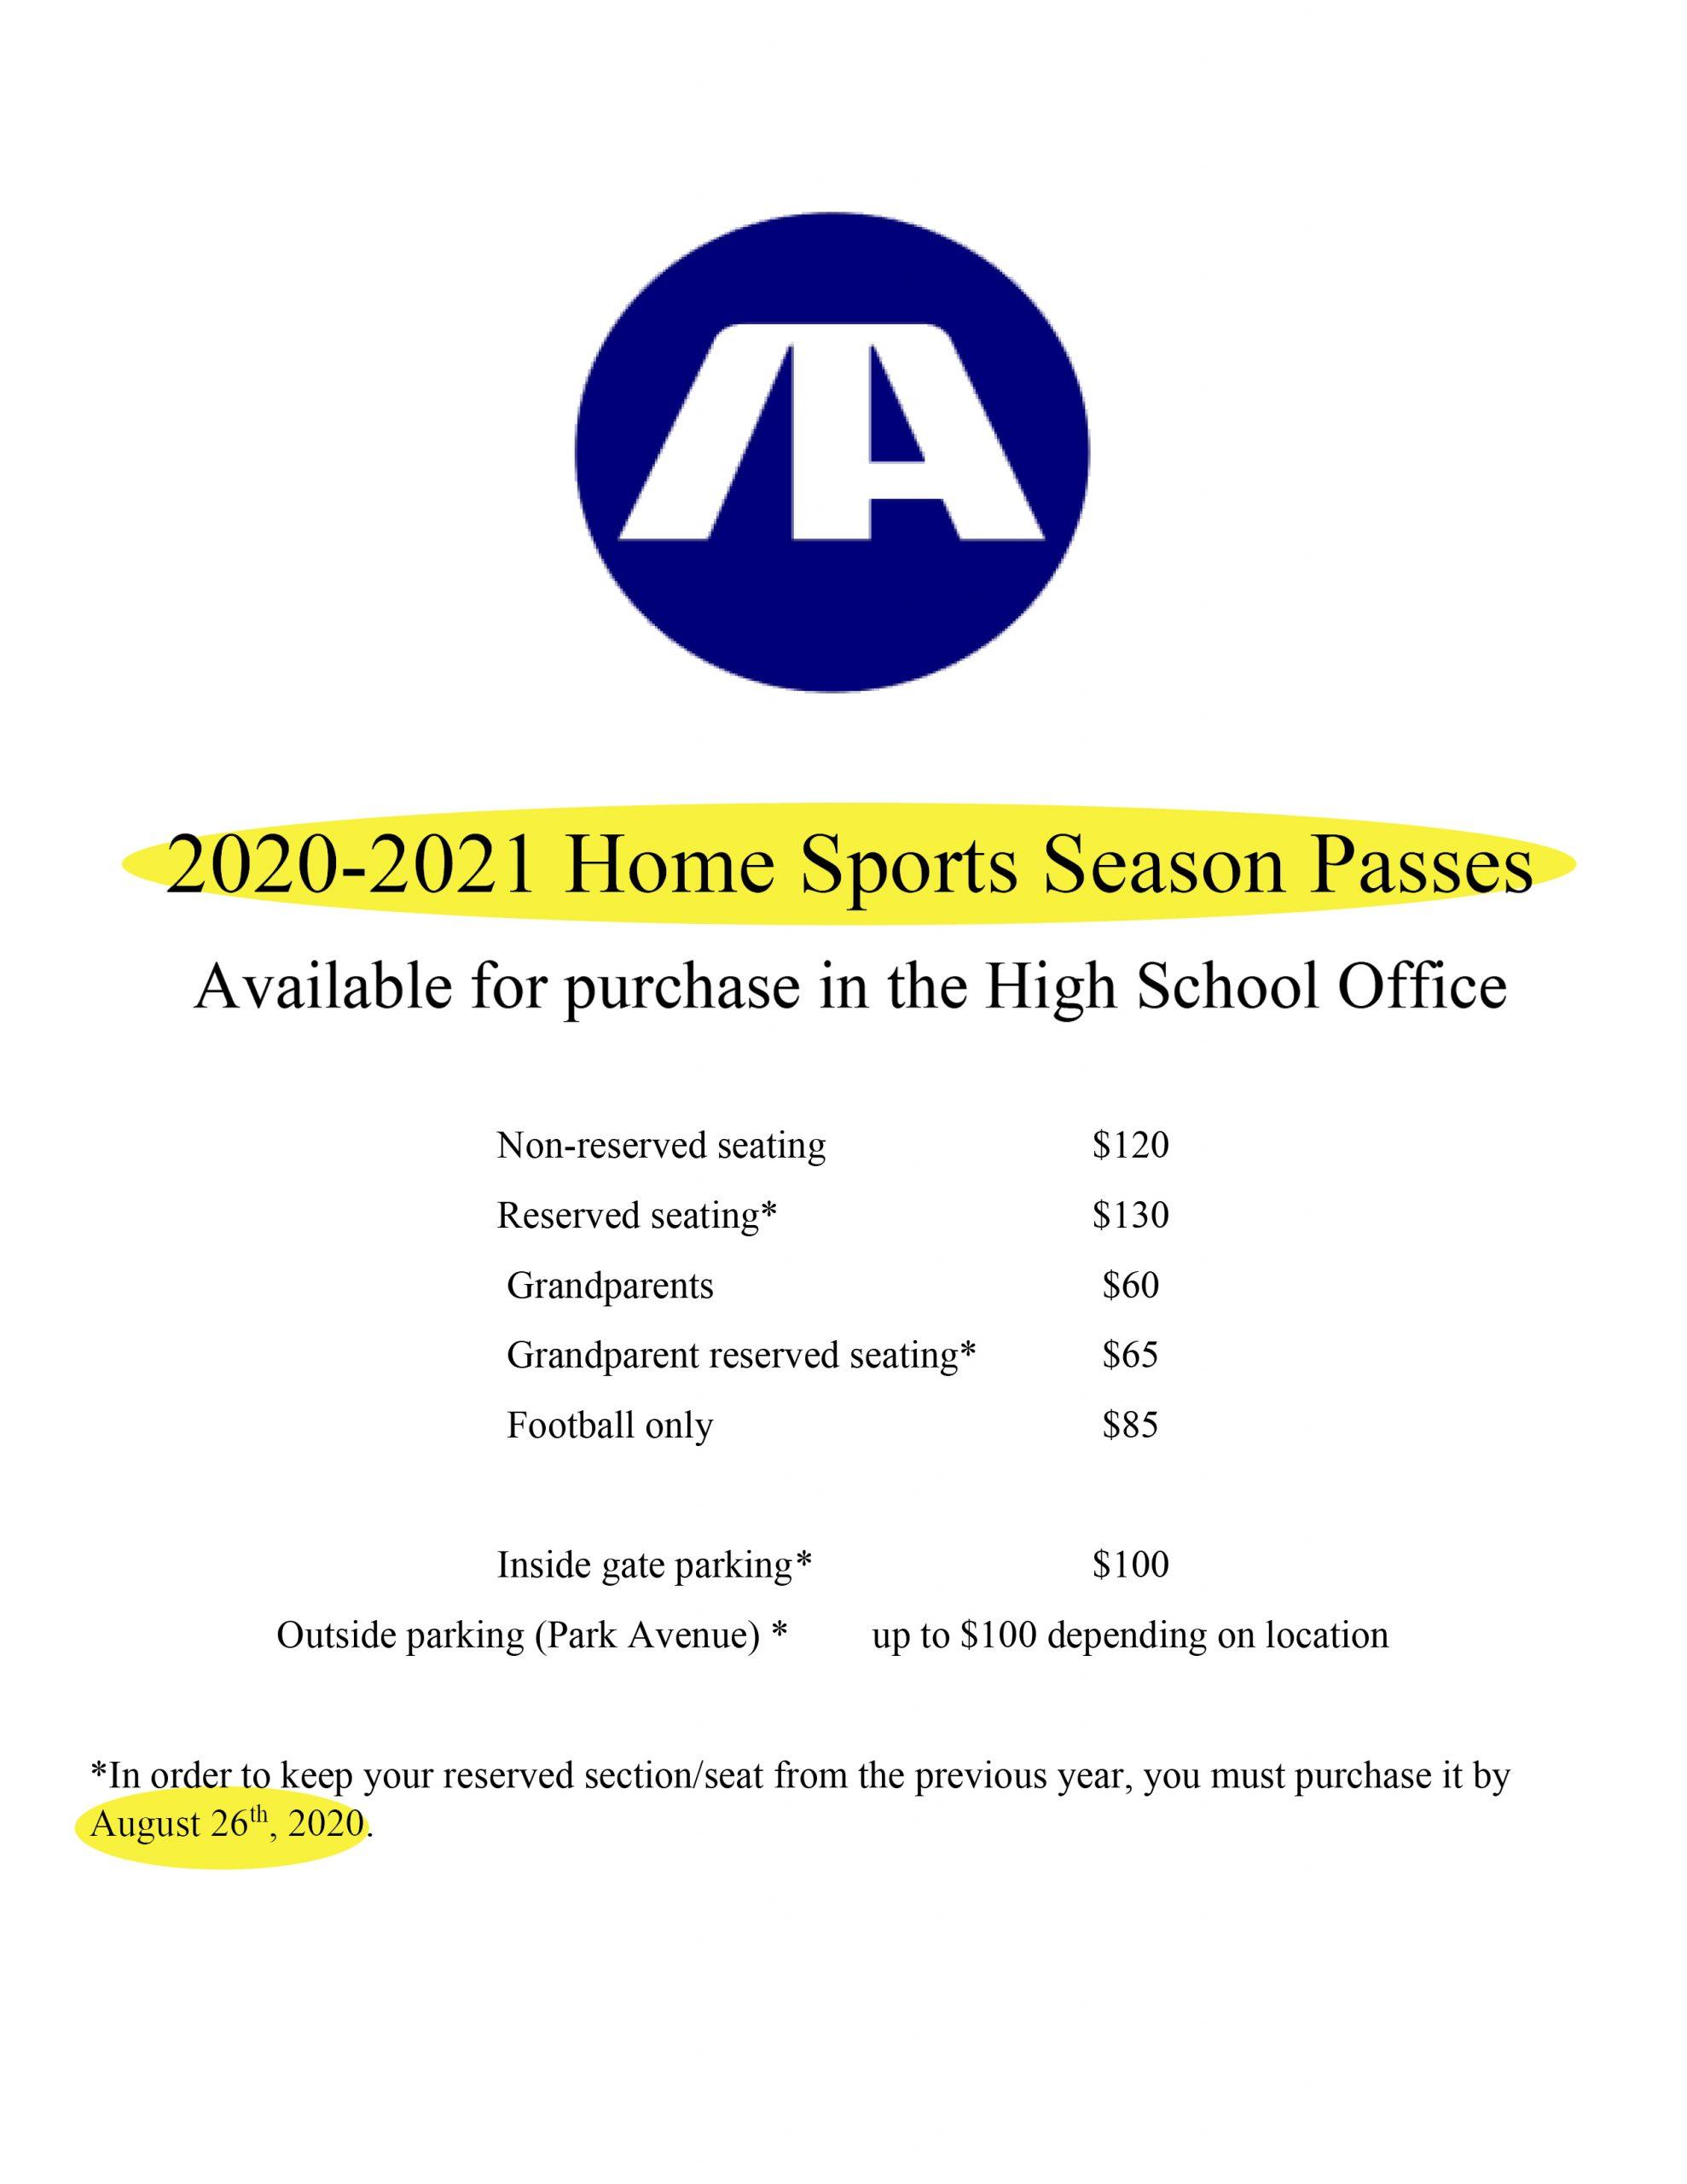 AAA sports passes